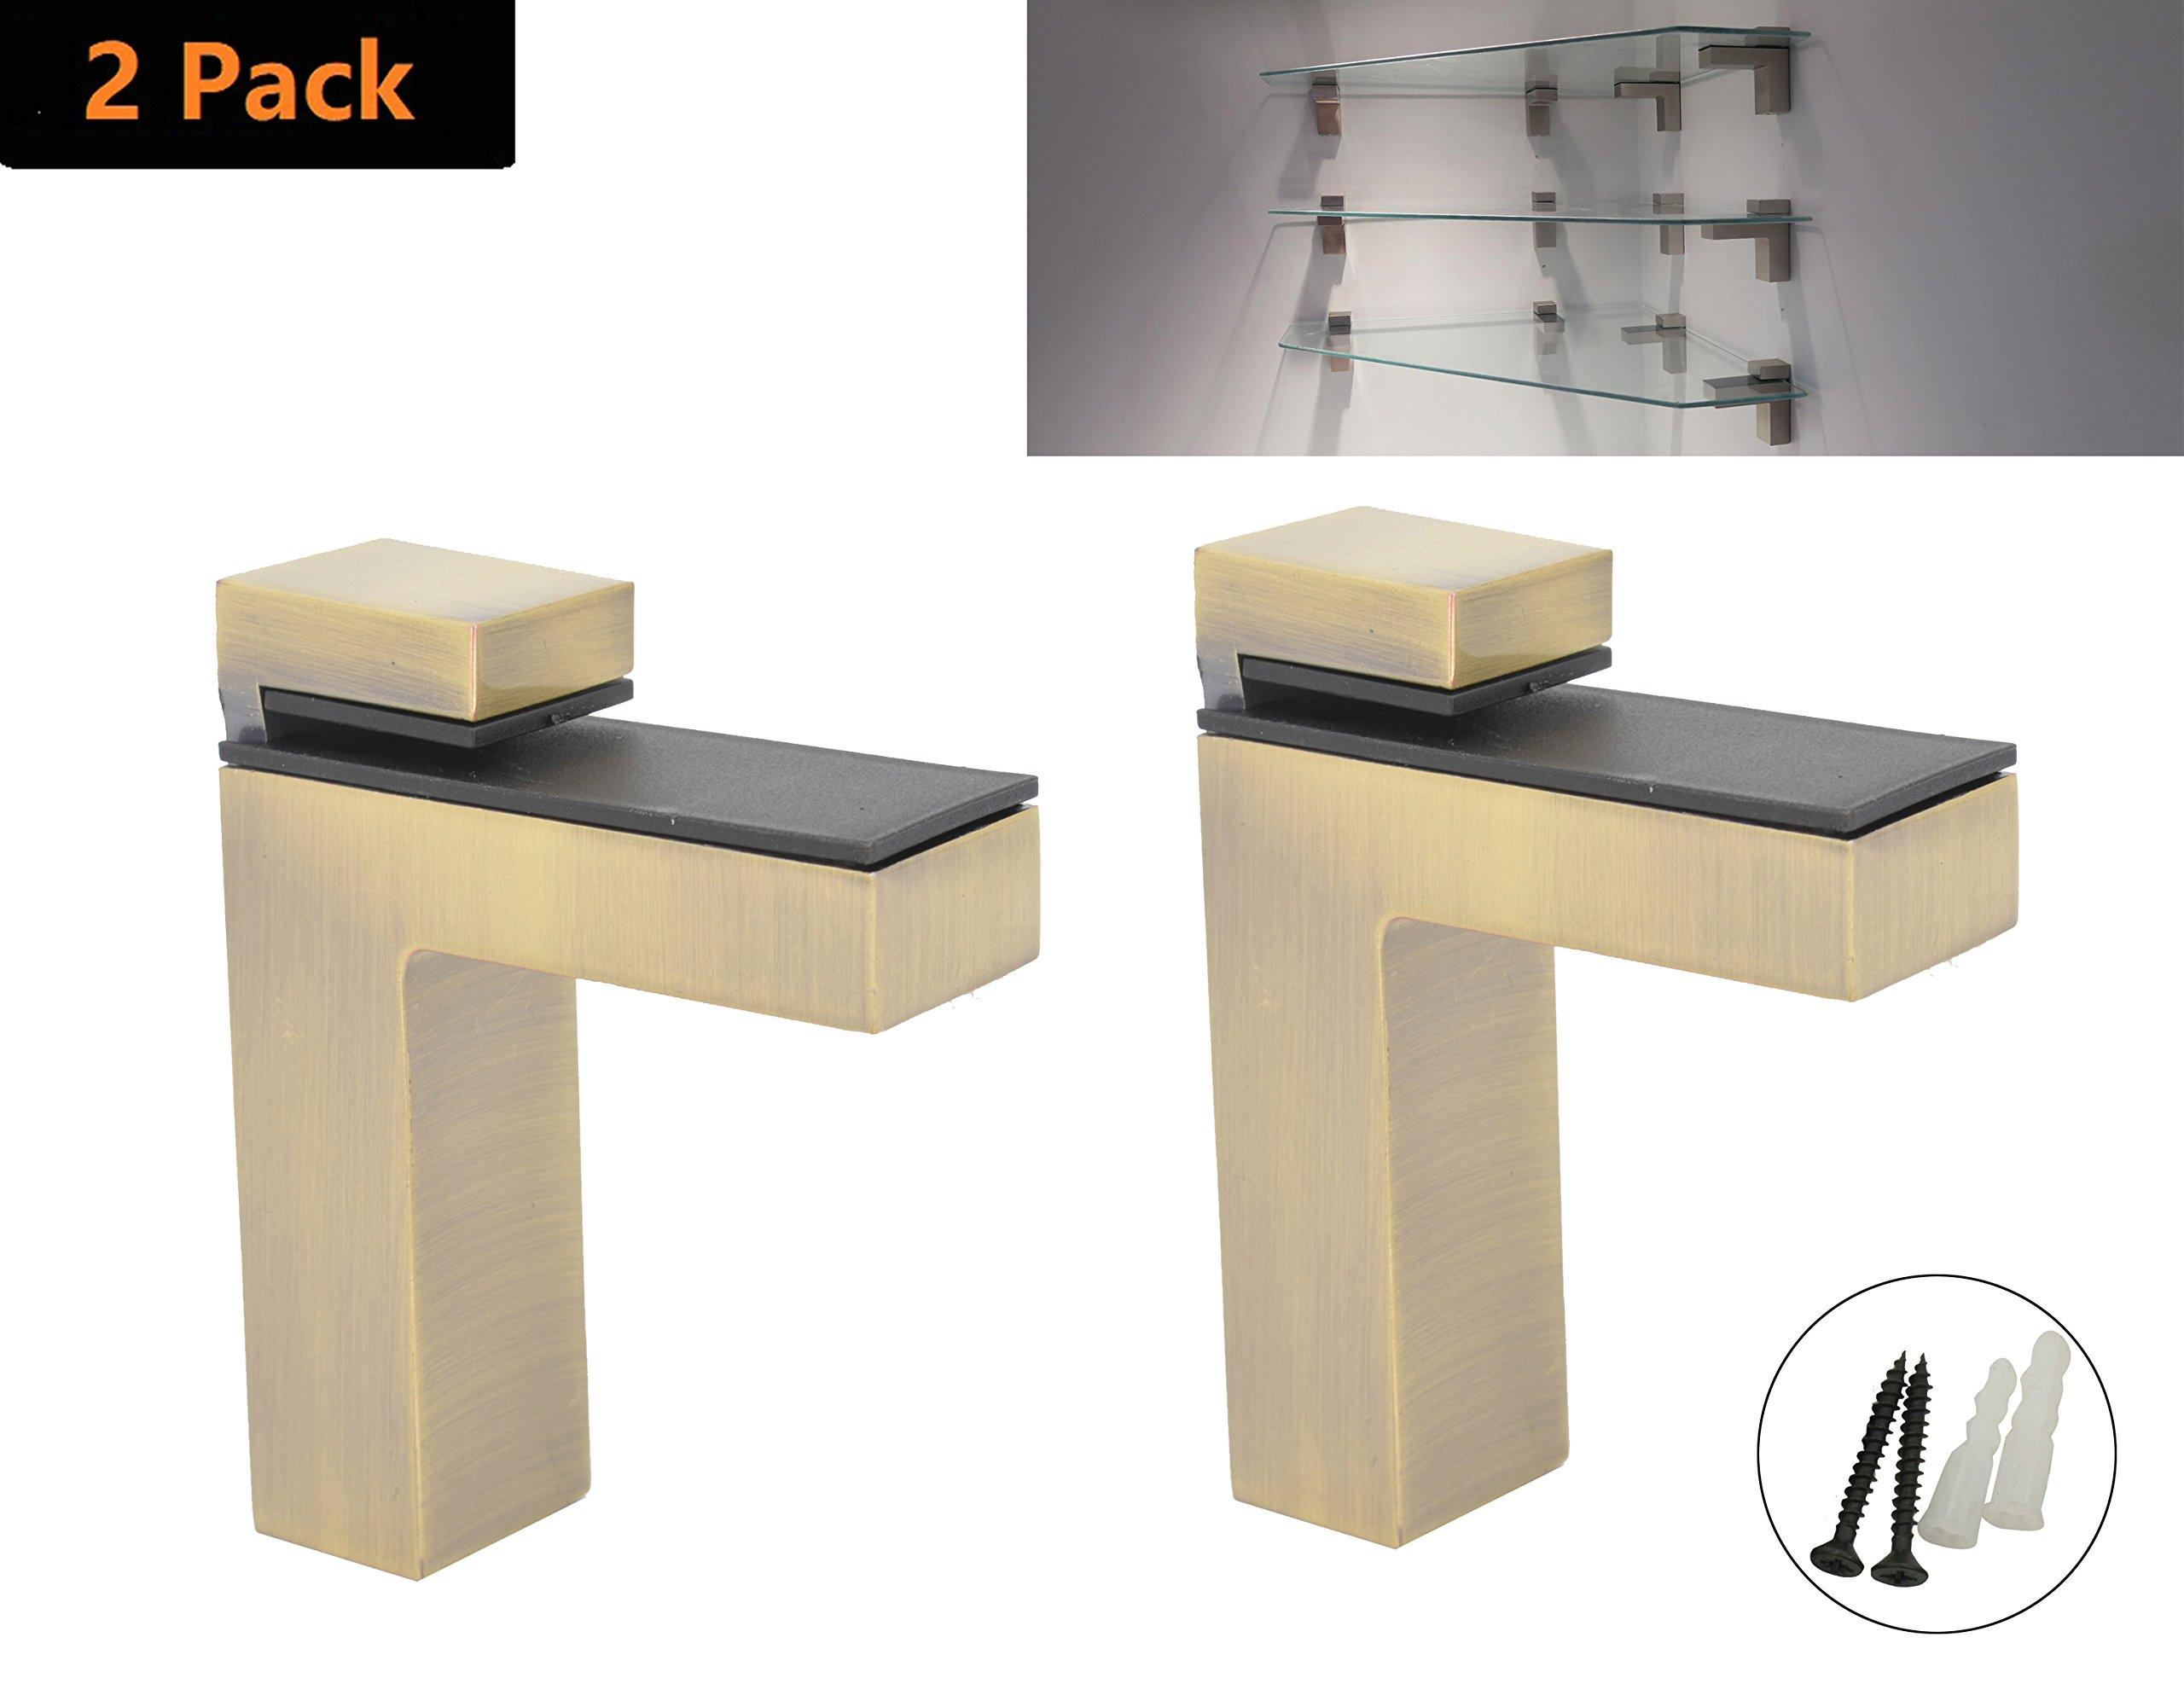 AddGrace 2 Pack Adjustable Glass Shelf Bathroom Shelf Bracket Wall Mount Brushed Chrome (Bronze) S